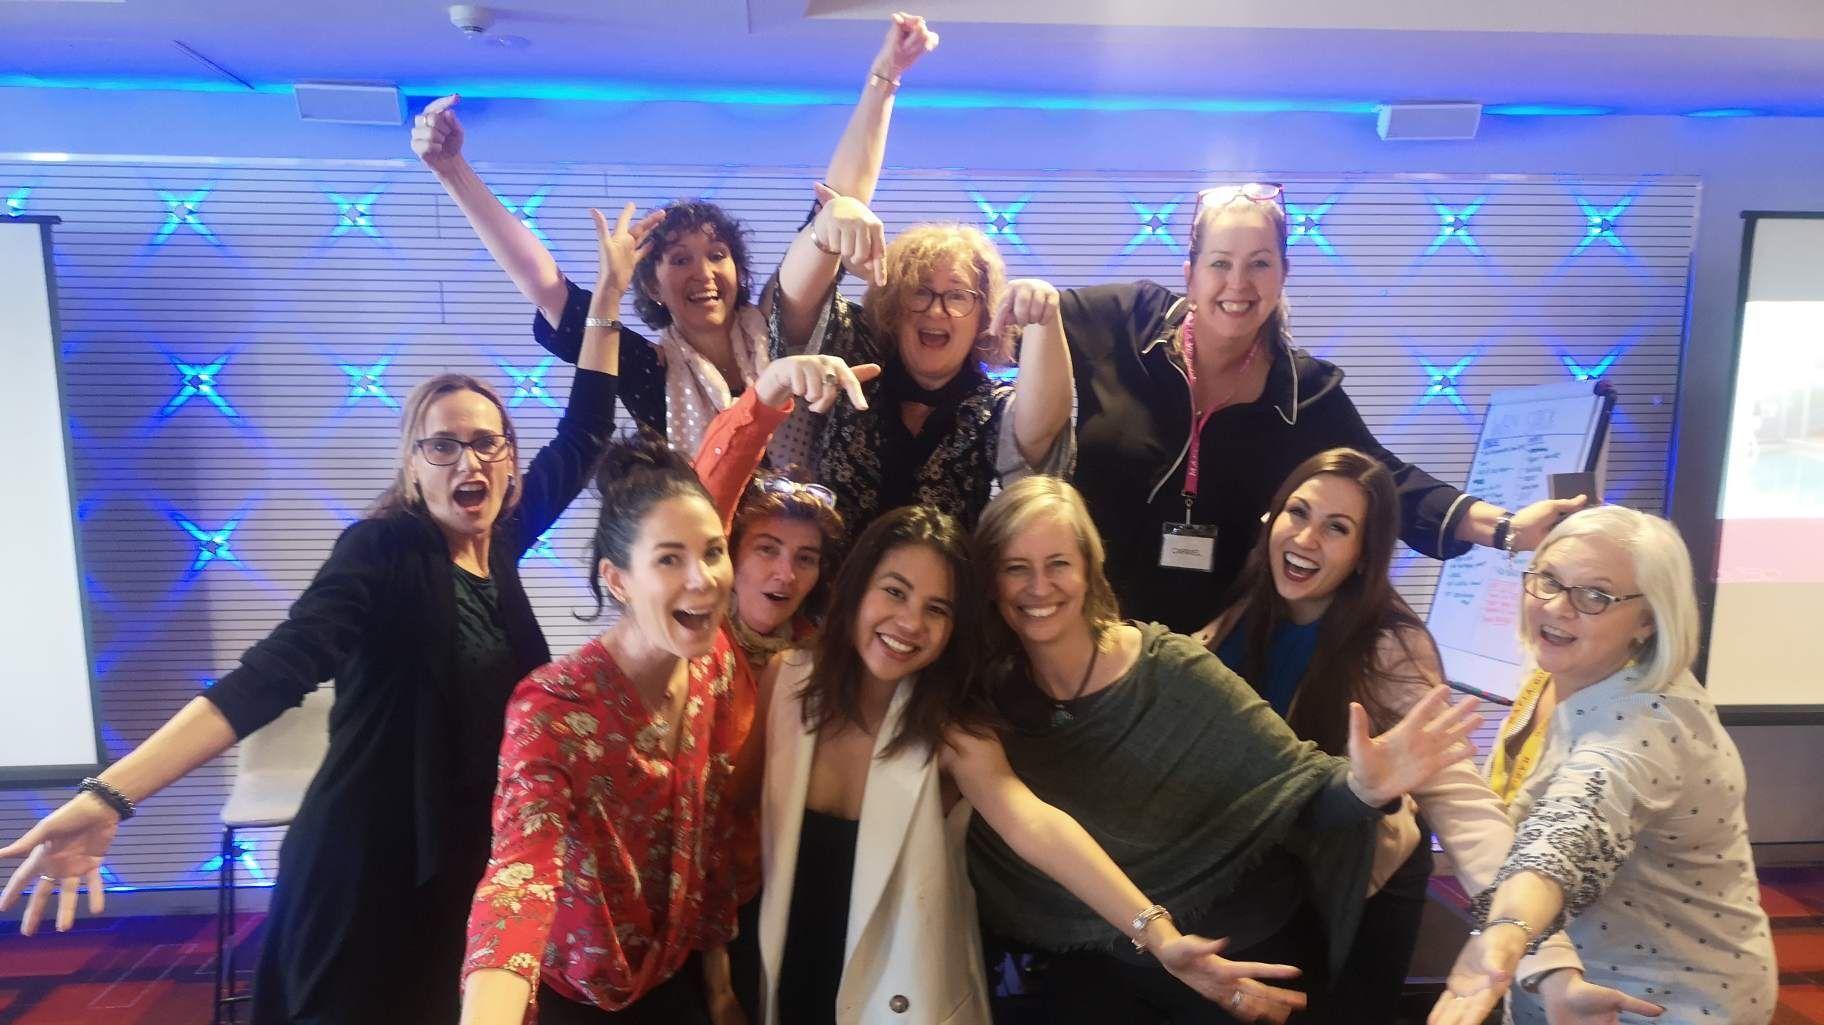 Women's Holistic Health and Wellness - Perth